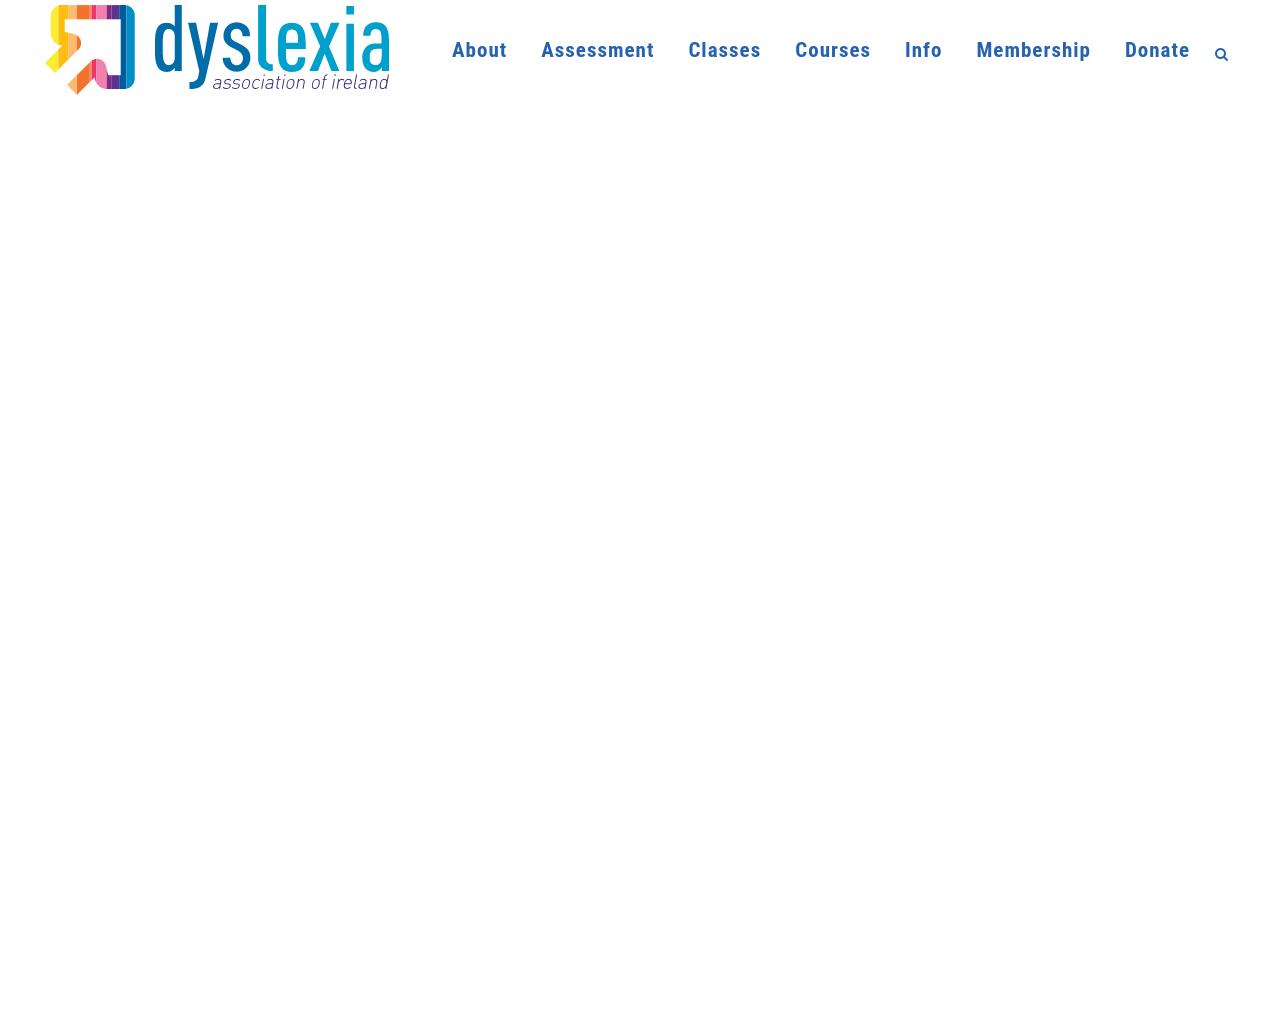 Dyslexia Association Ireland